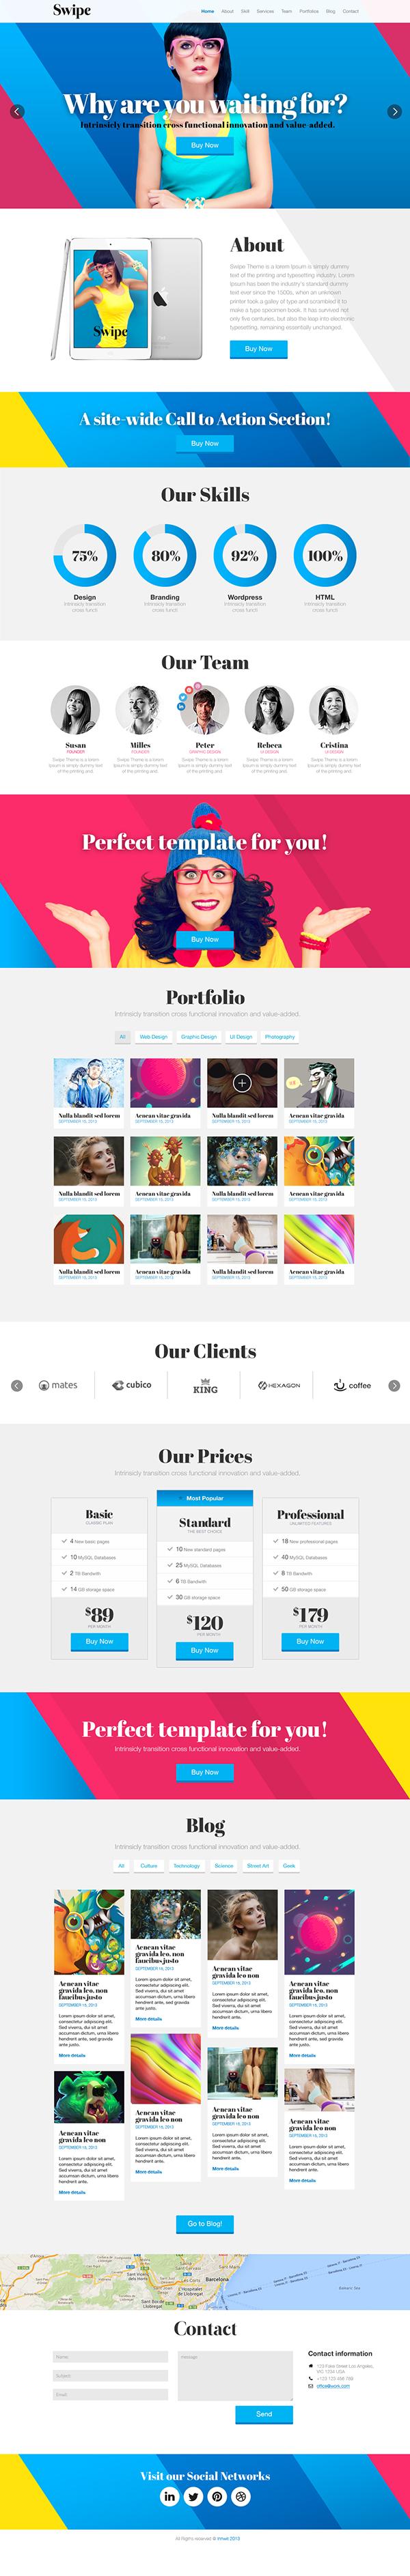 wordpress Bootstrap 3.0 creative modern One Page Responsive Retina Ready